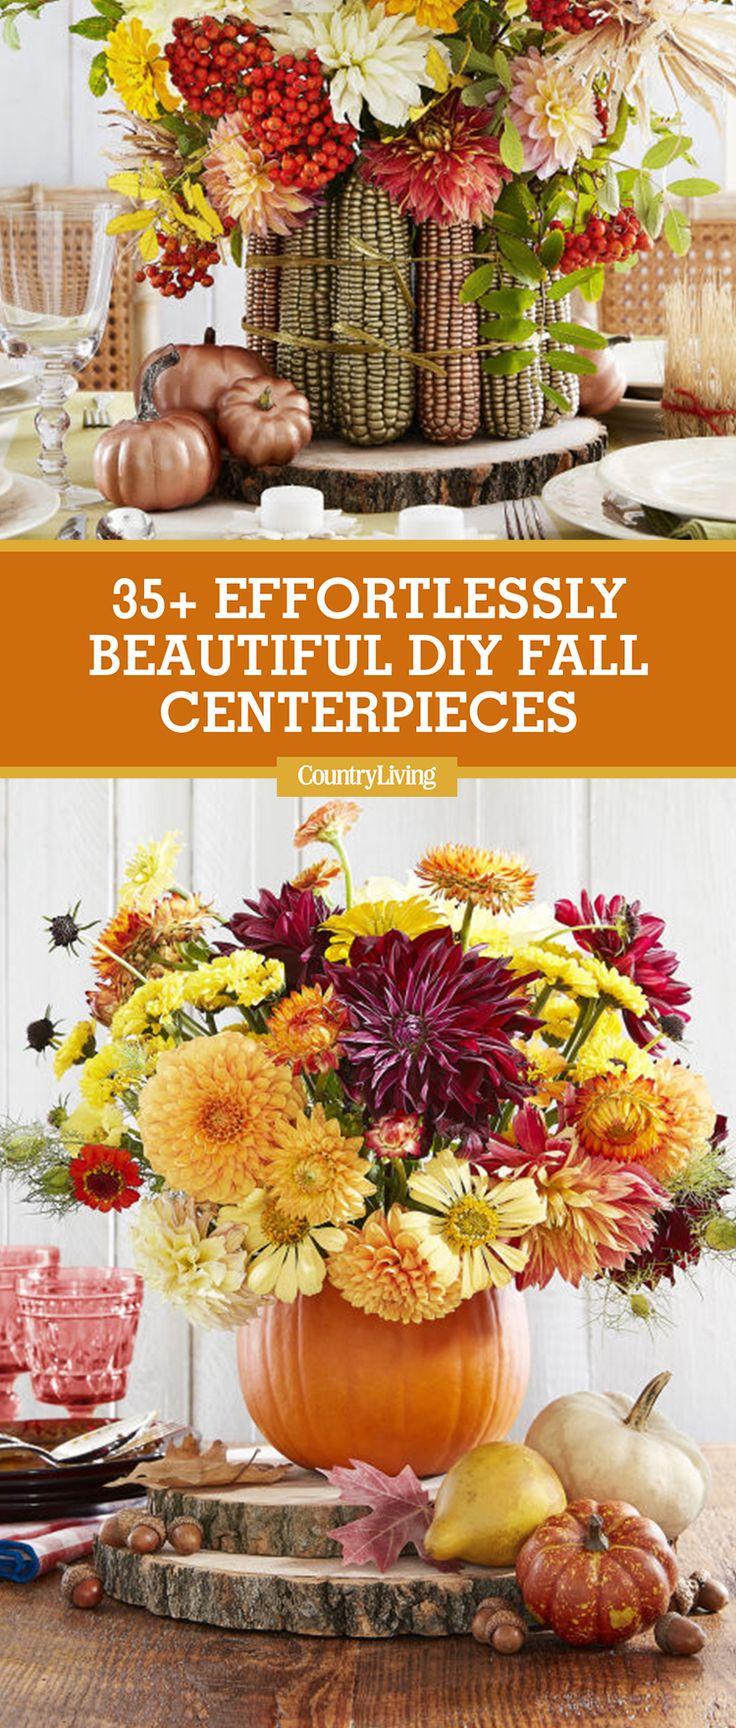 35 Beautiful Fall Centerpieces You Can Make